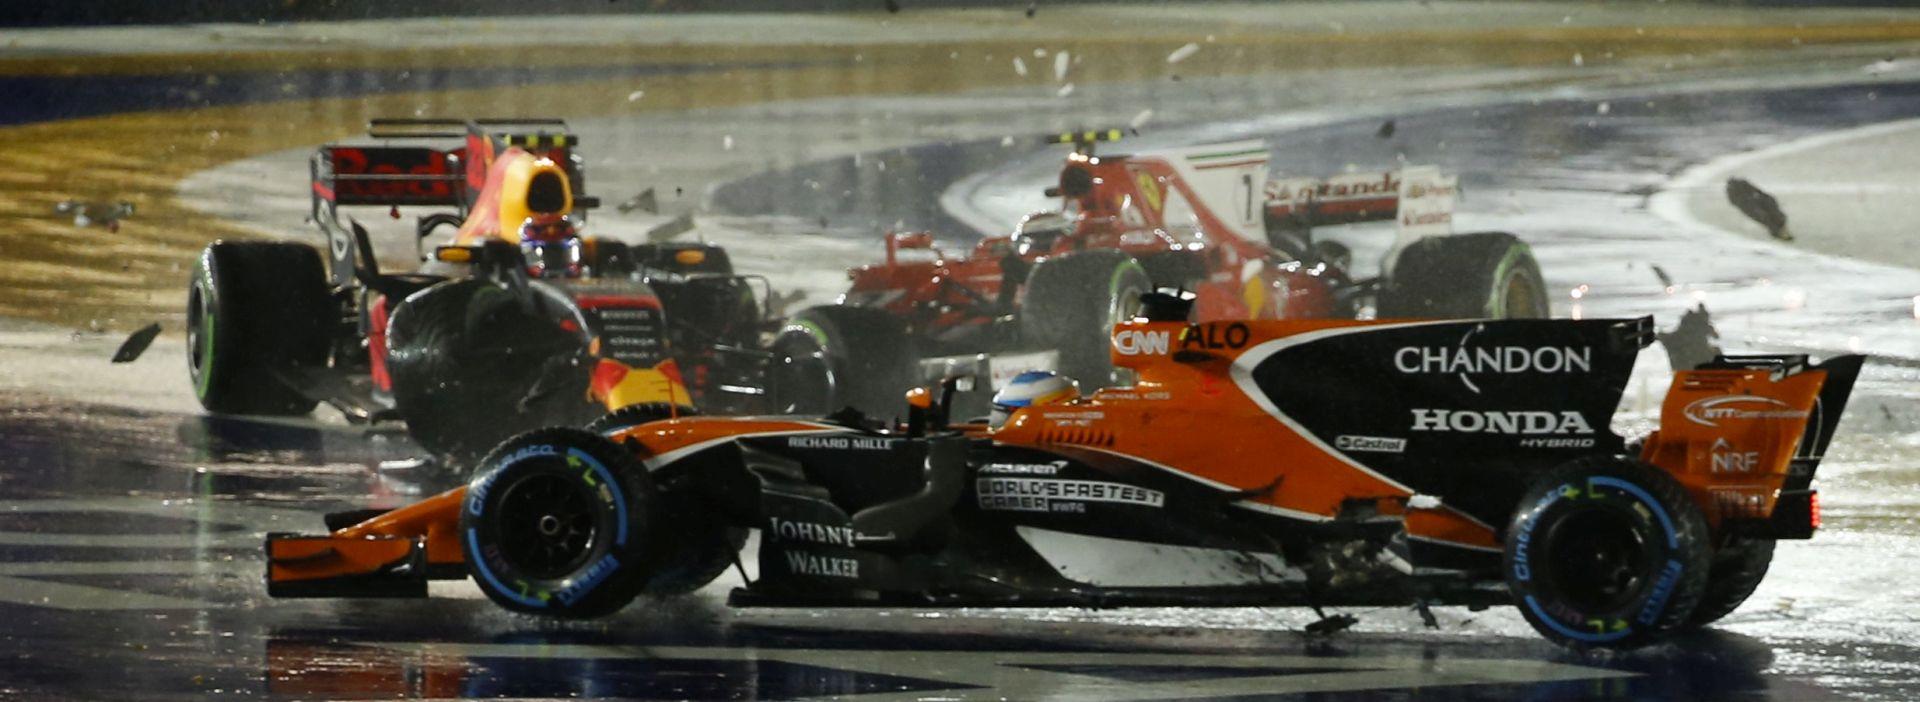 BRITANAC ISKORISTIO POKLON Hamiltonu VN Singapura, Vettel odustao